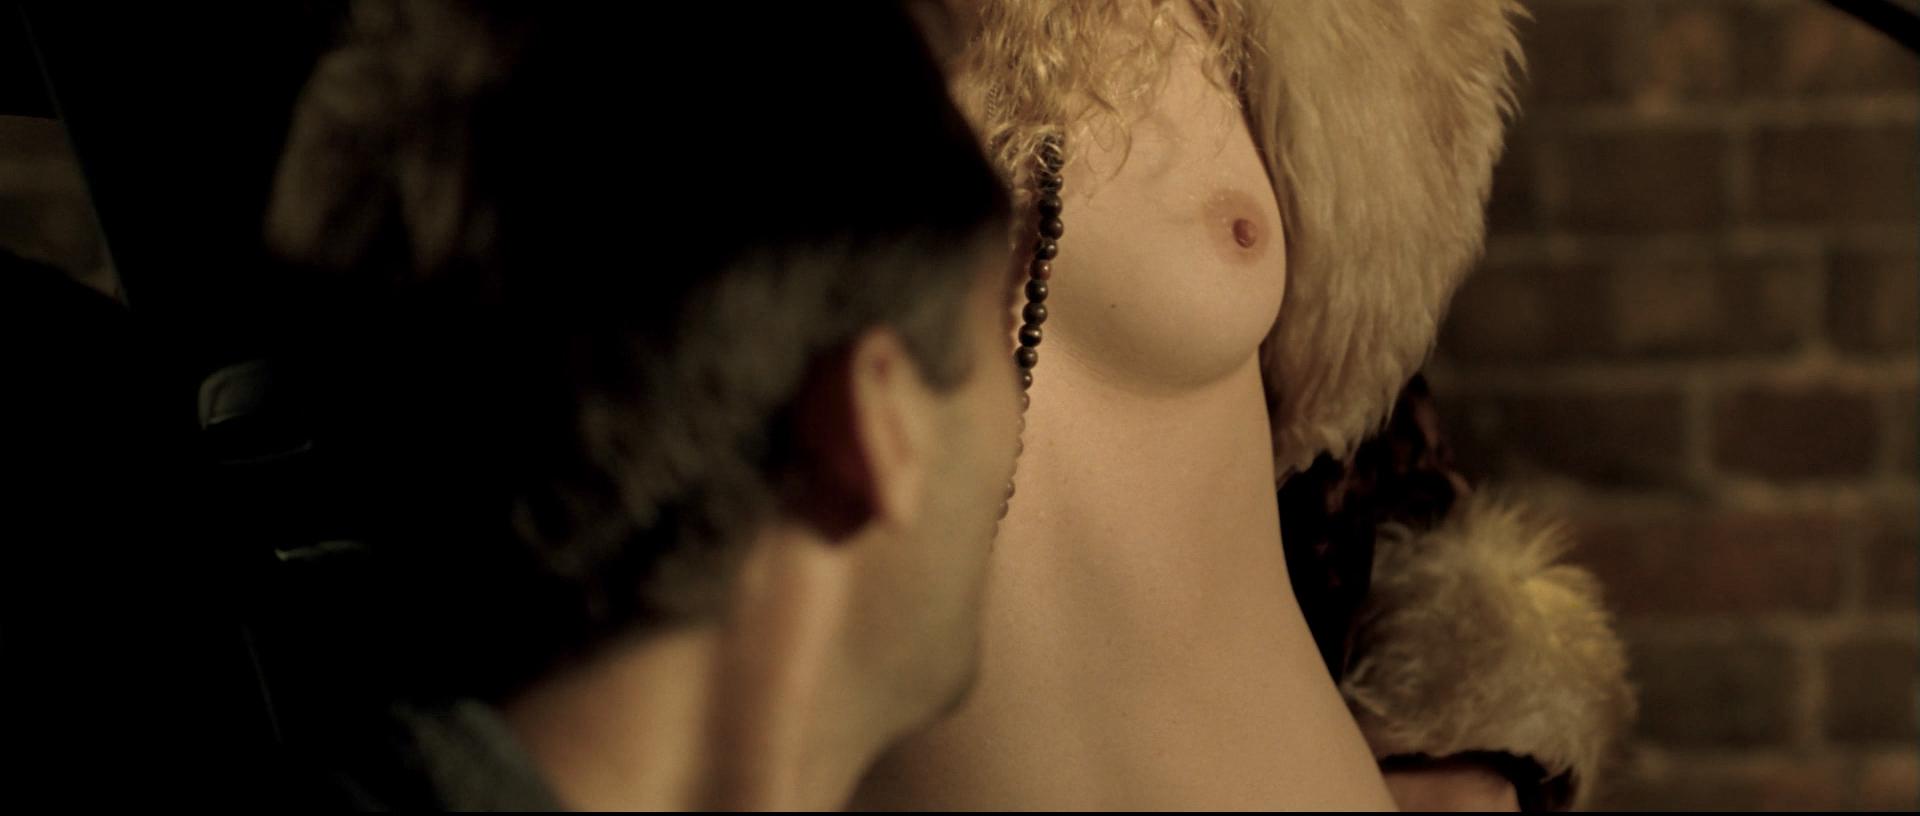 Juliette Binoche nude topless and sex Vera Farmiga nude and Robin Wright hot - Breaking and Entering (2006) HD 1080p BluRay (8)